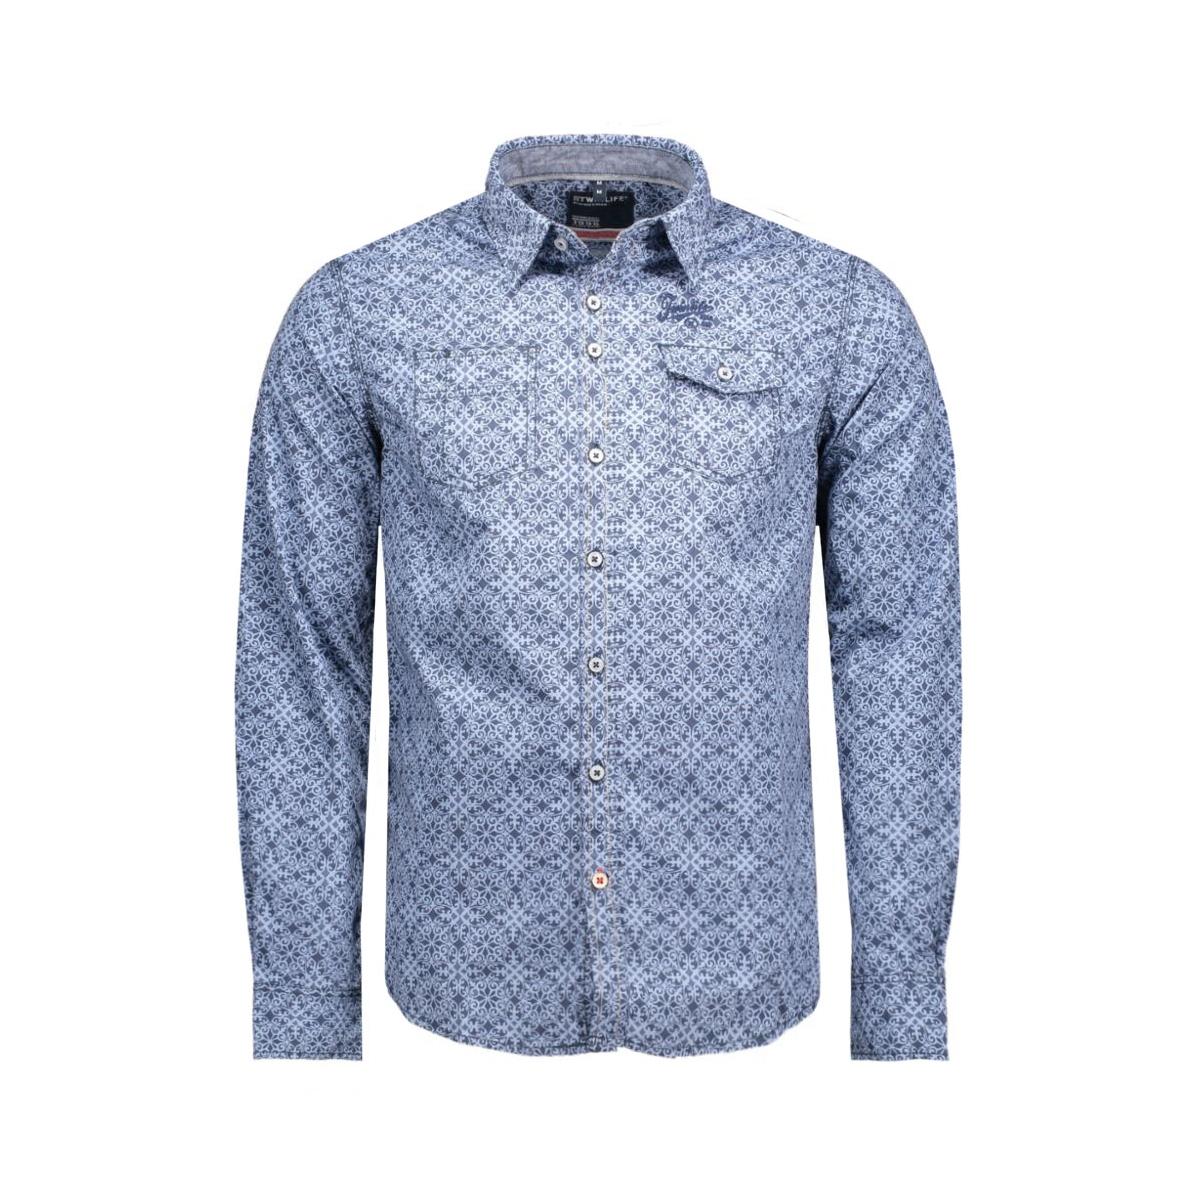 msh651647 twinlife overhemd 6510